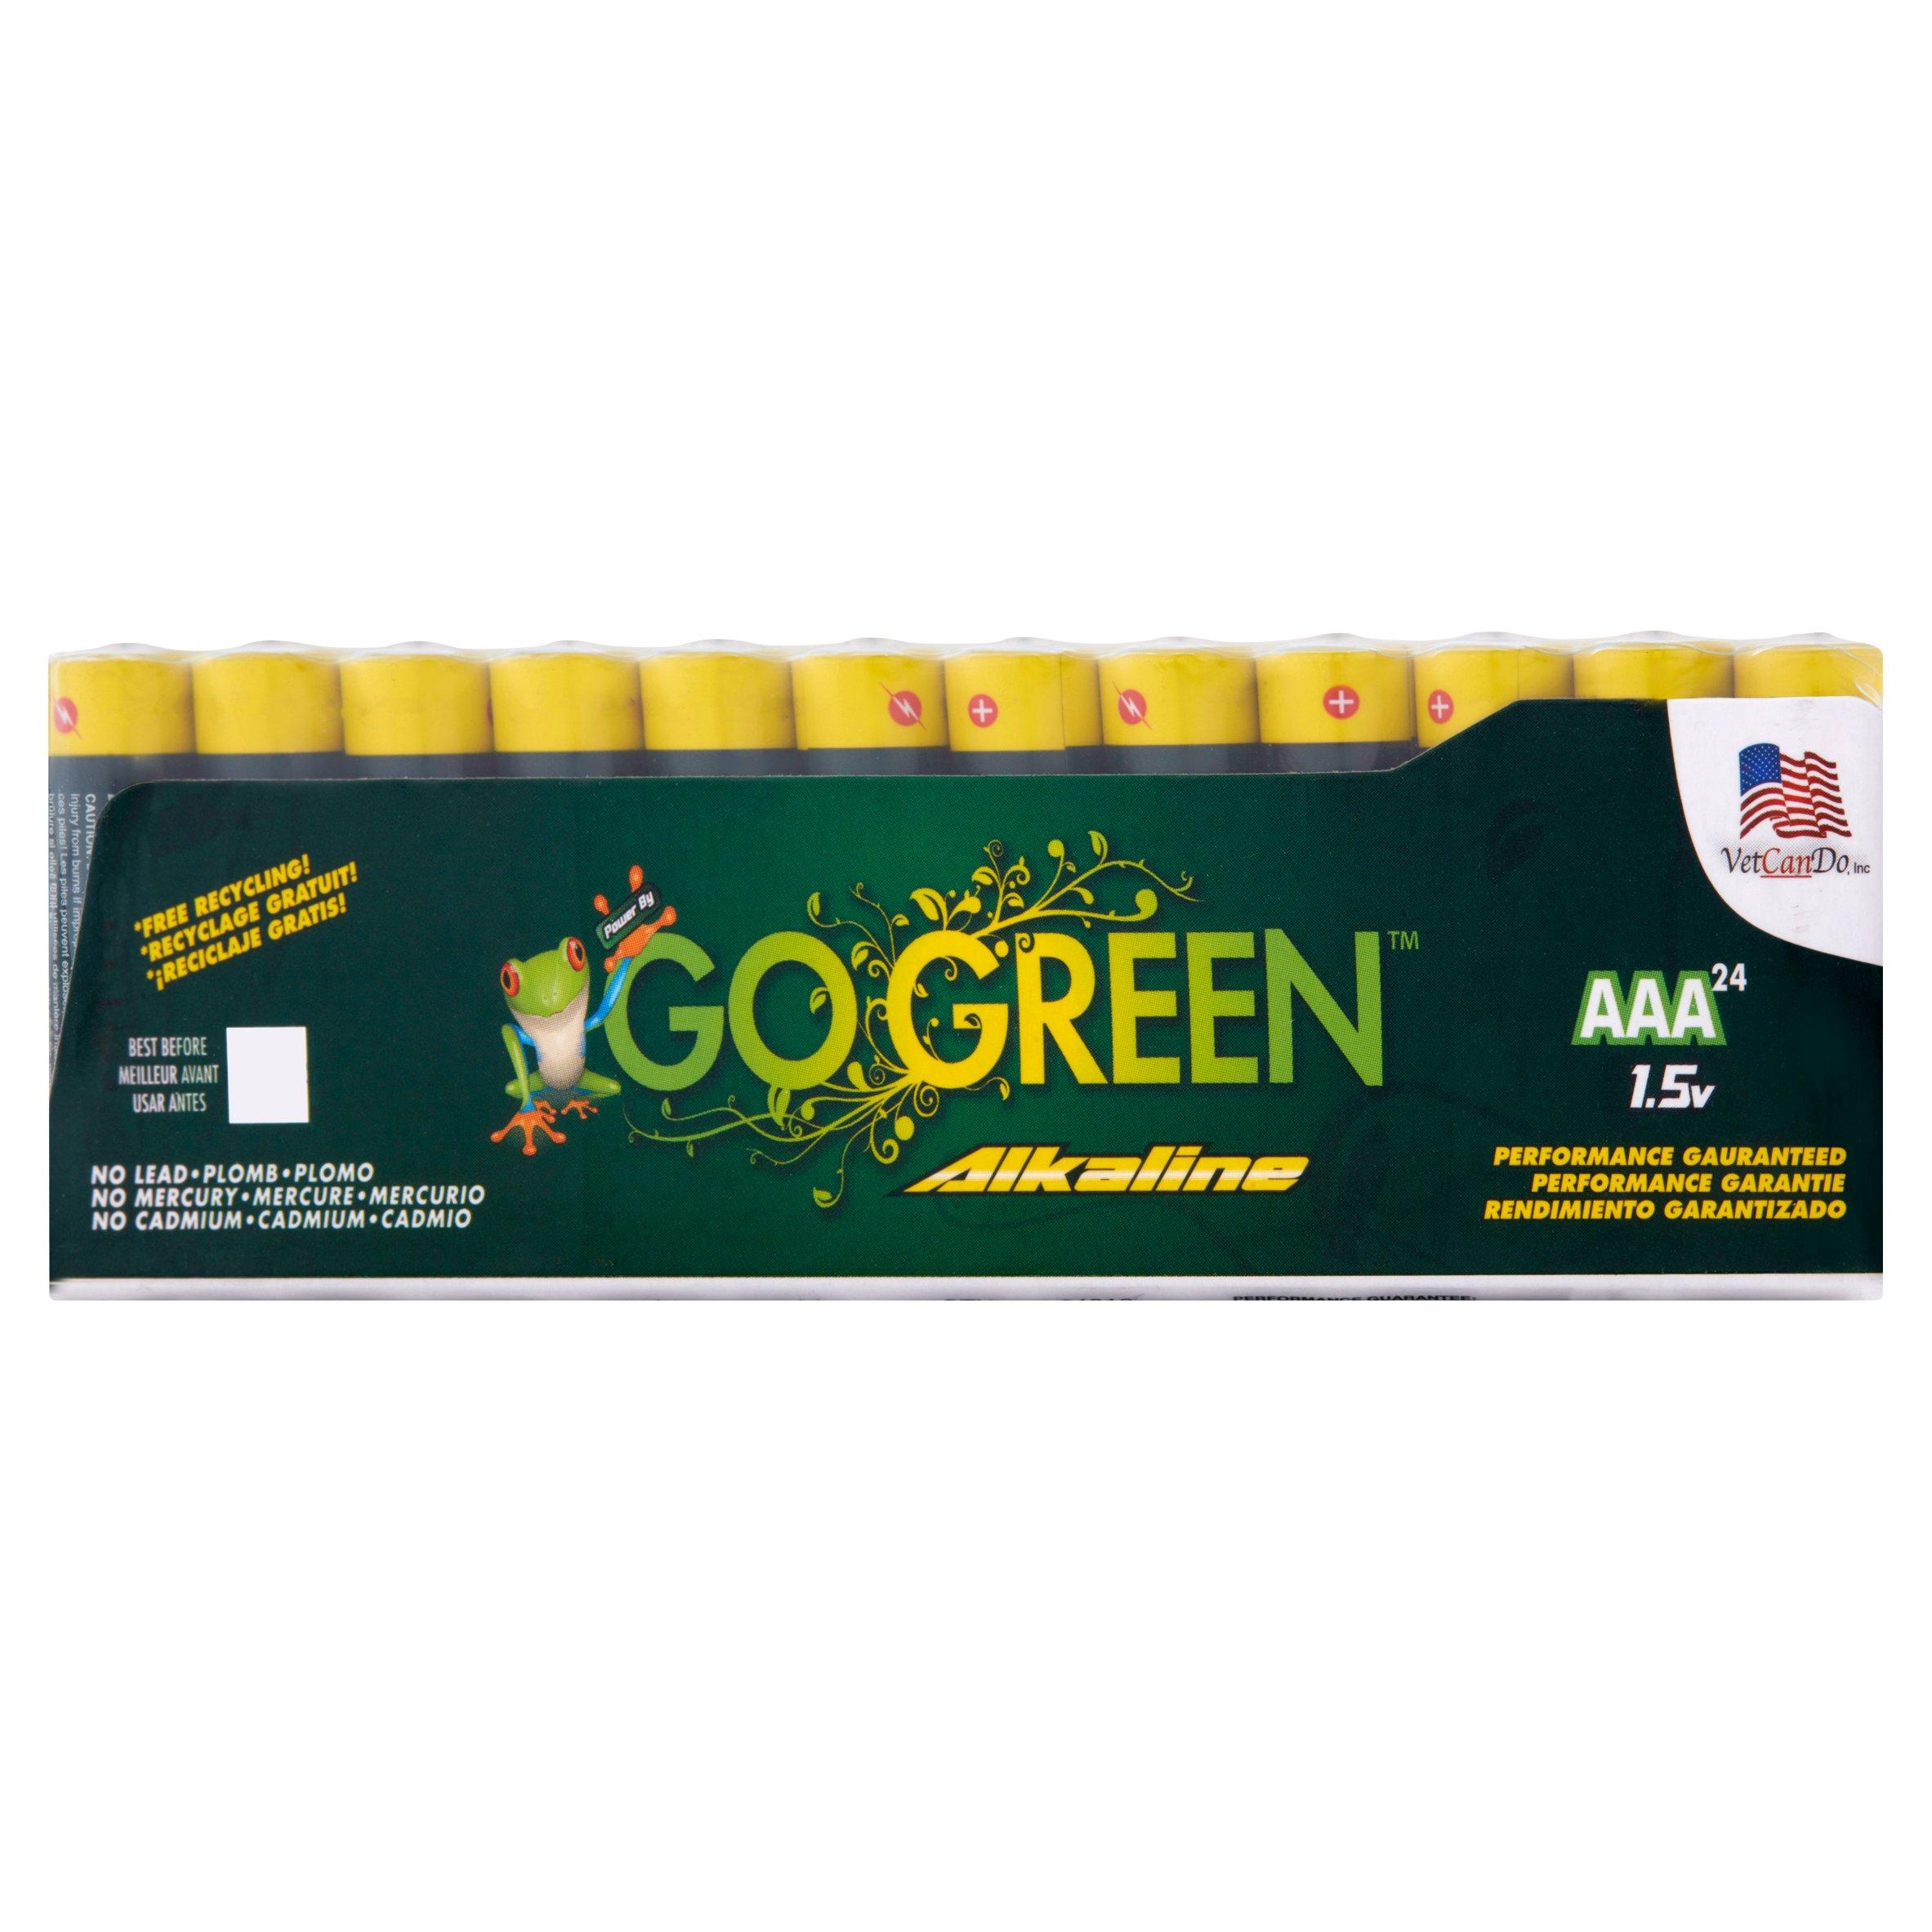 Go Green AAA 1.5V Alkaline Battery, 24 count